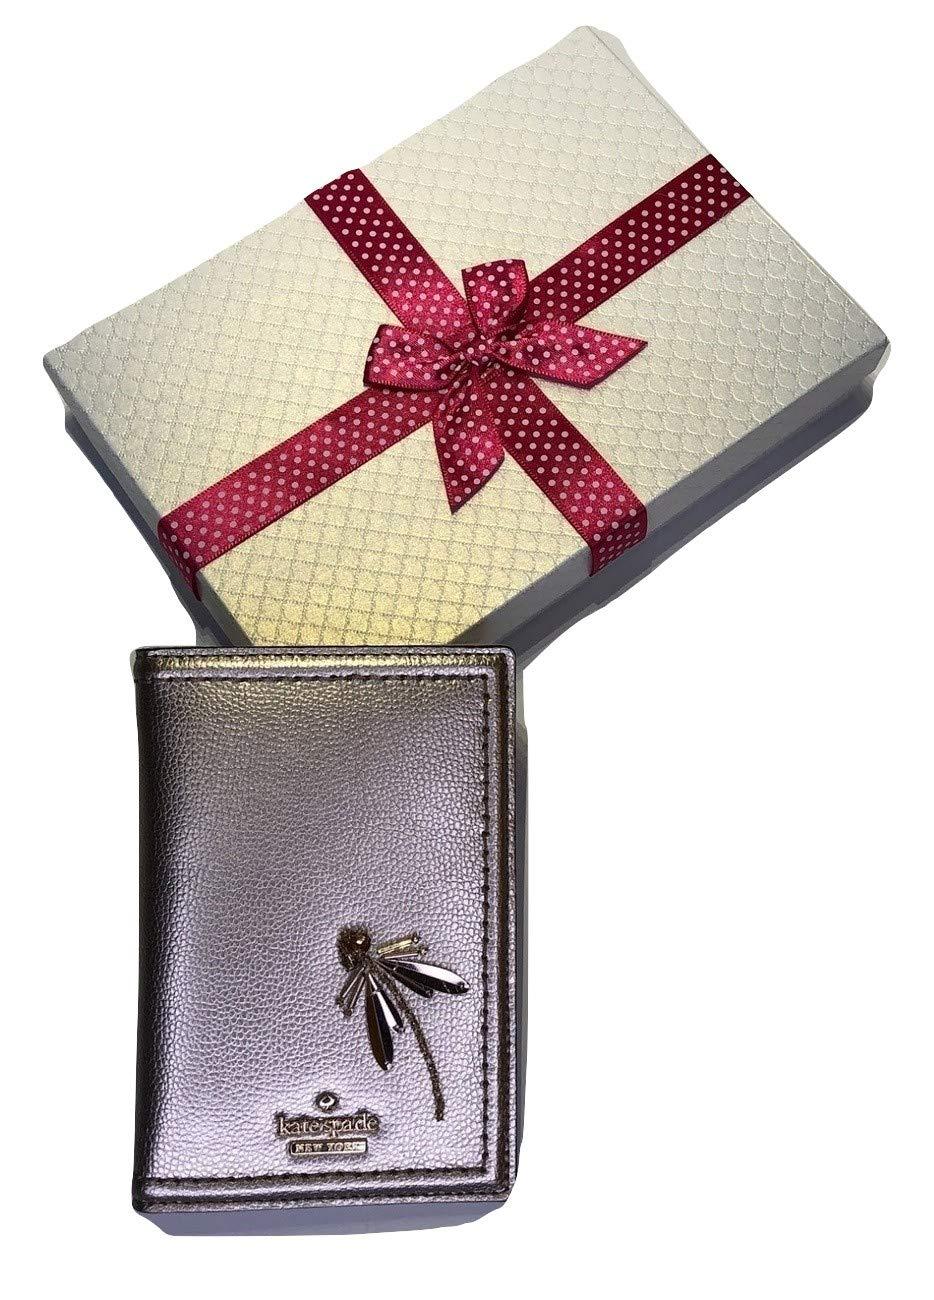 Kate Spade New York Imogene Passport Case Holder (Patterson Drive Dragonfly WLRU5247 Gold)